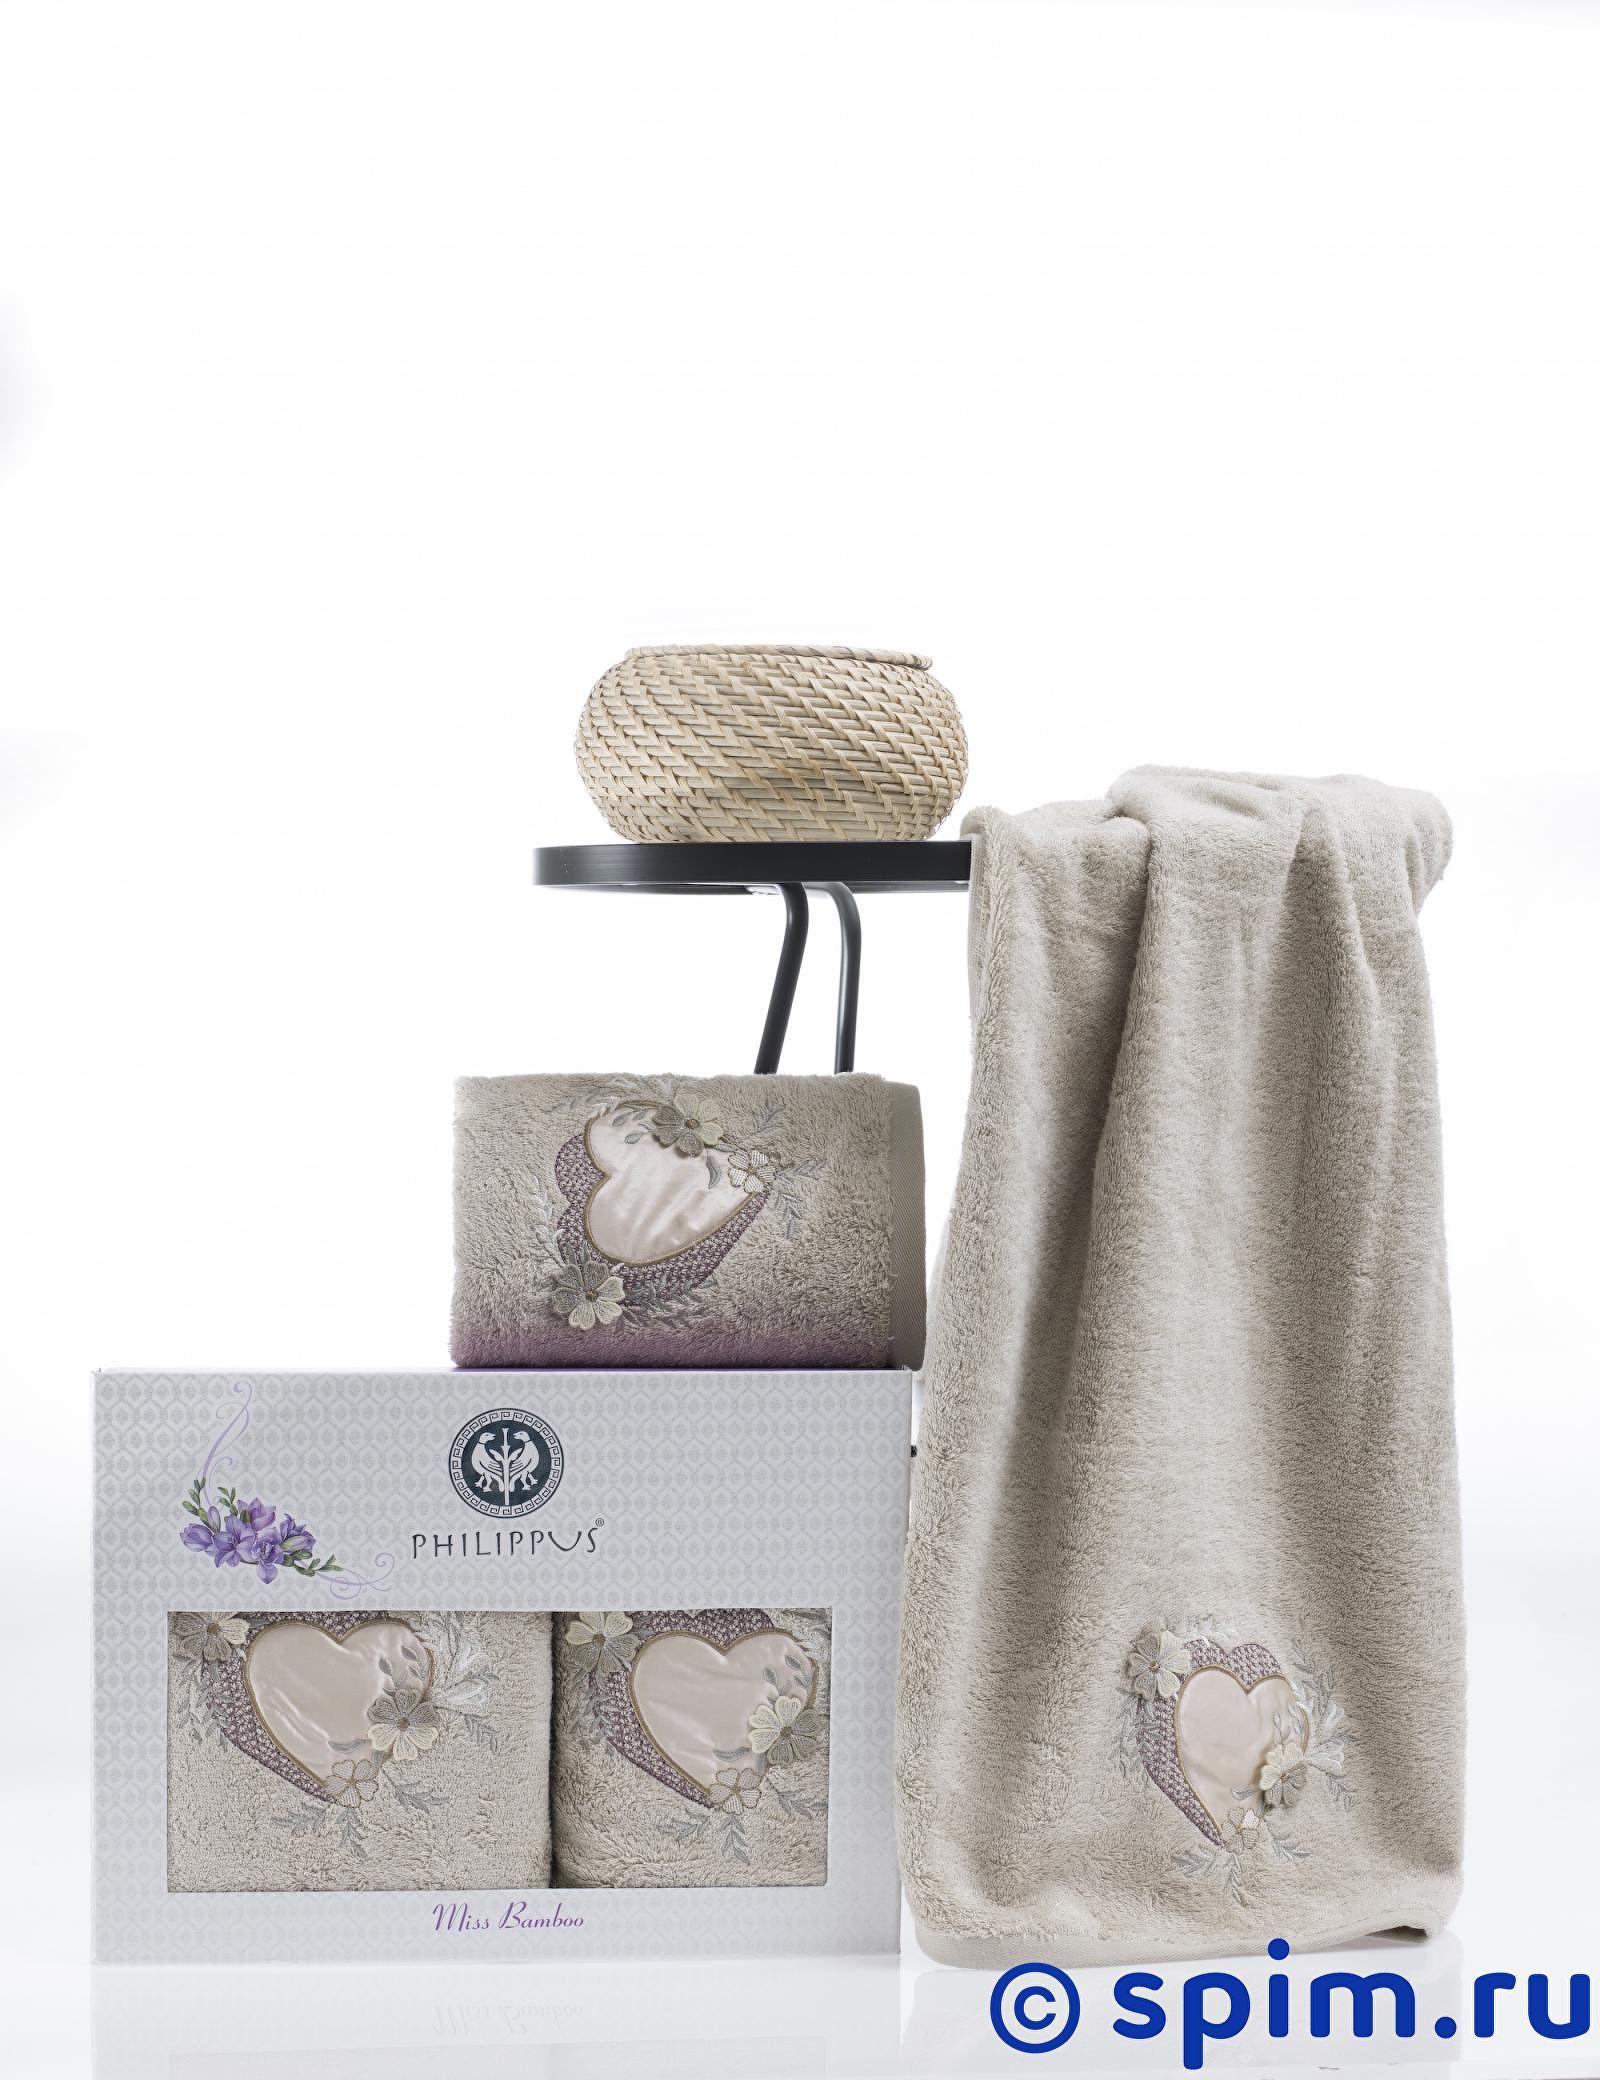 Комплект из 2-х полотенец Philippus Maura полотенца philippus полотенце maura цвет кремовый 50х90 см